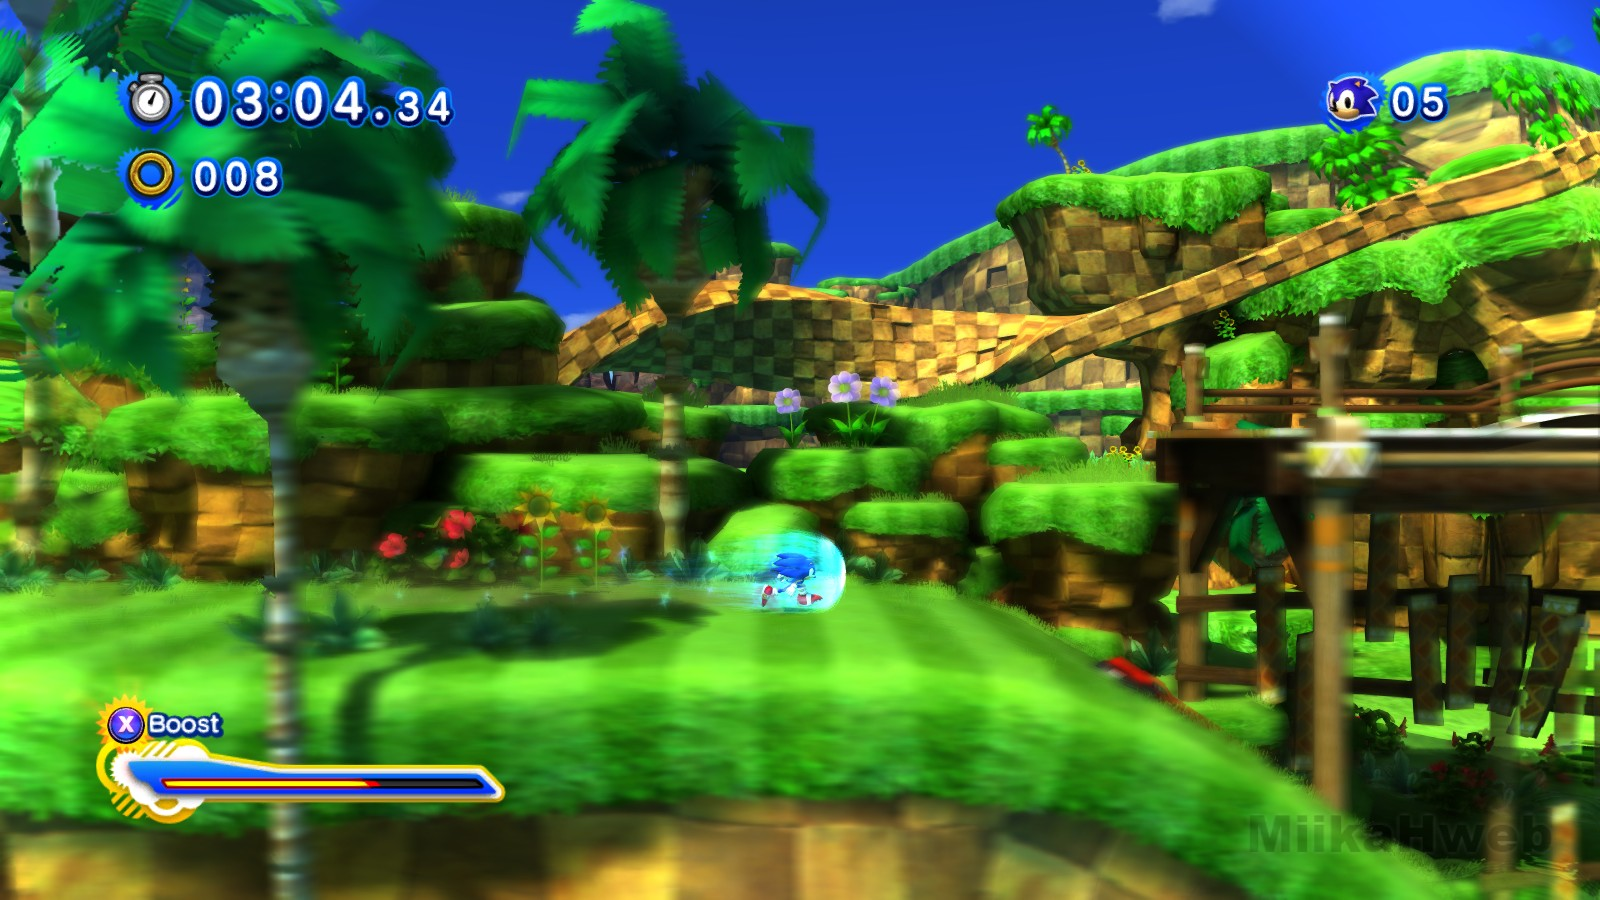 MiikaHweb - Game : Sonic Generations